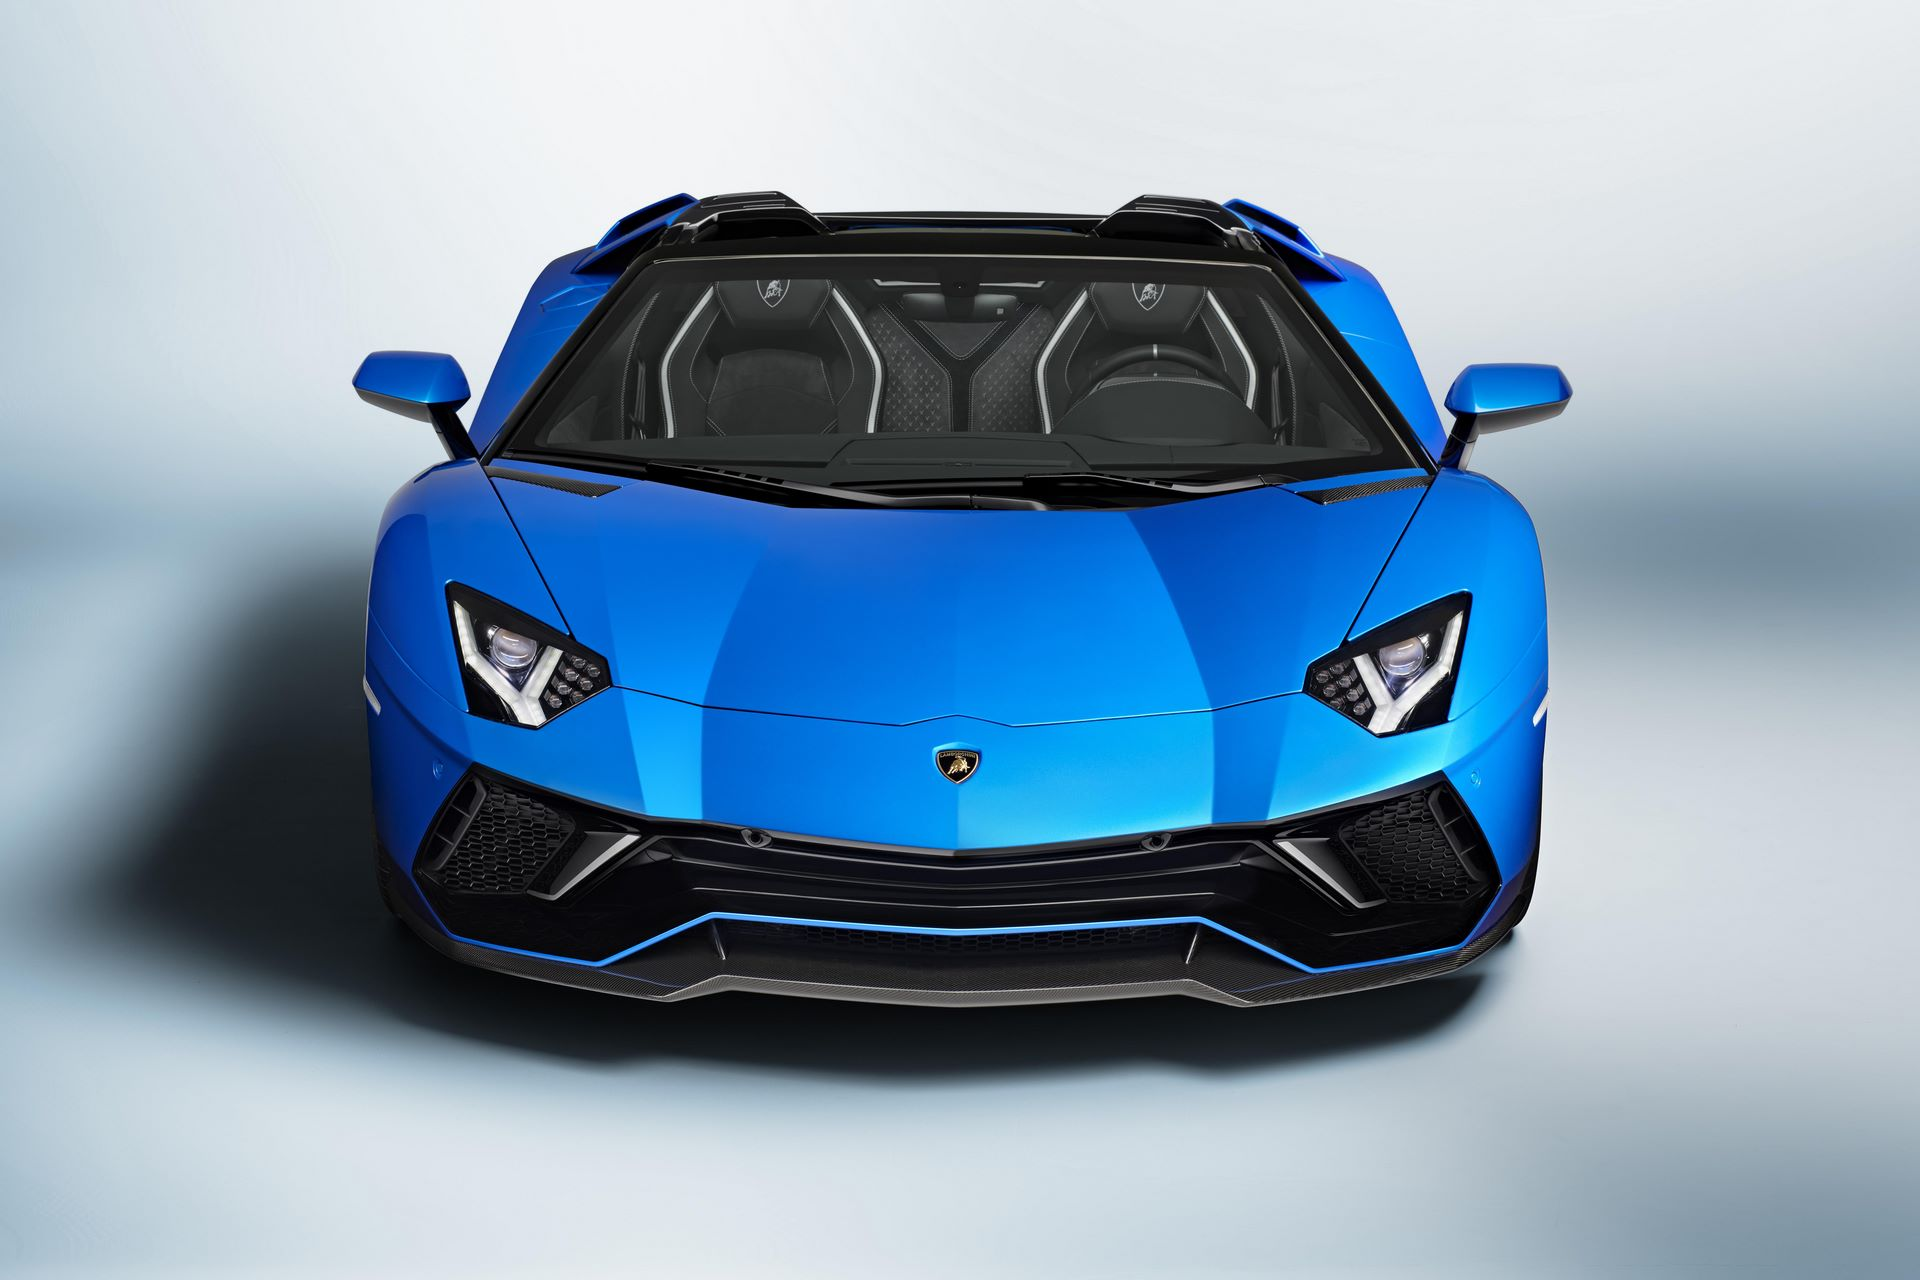 Lamborghini-Aventador-LP780-4-Ultimae-38